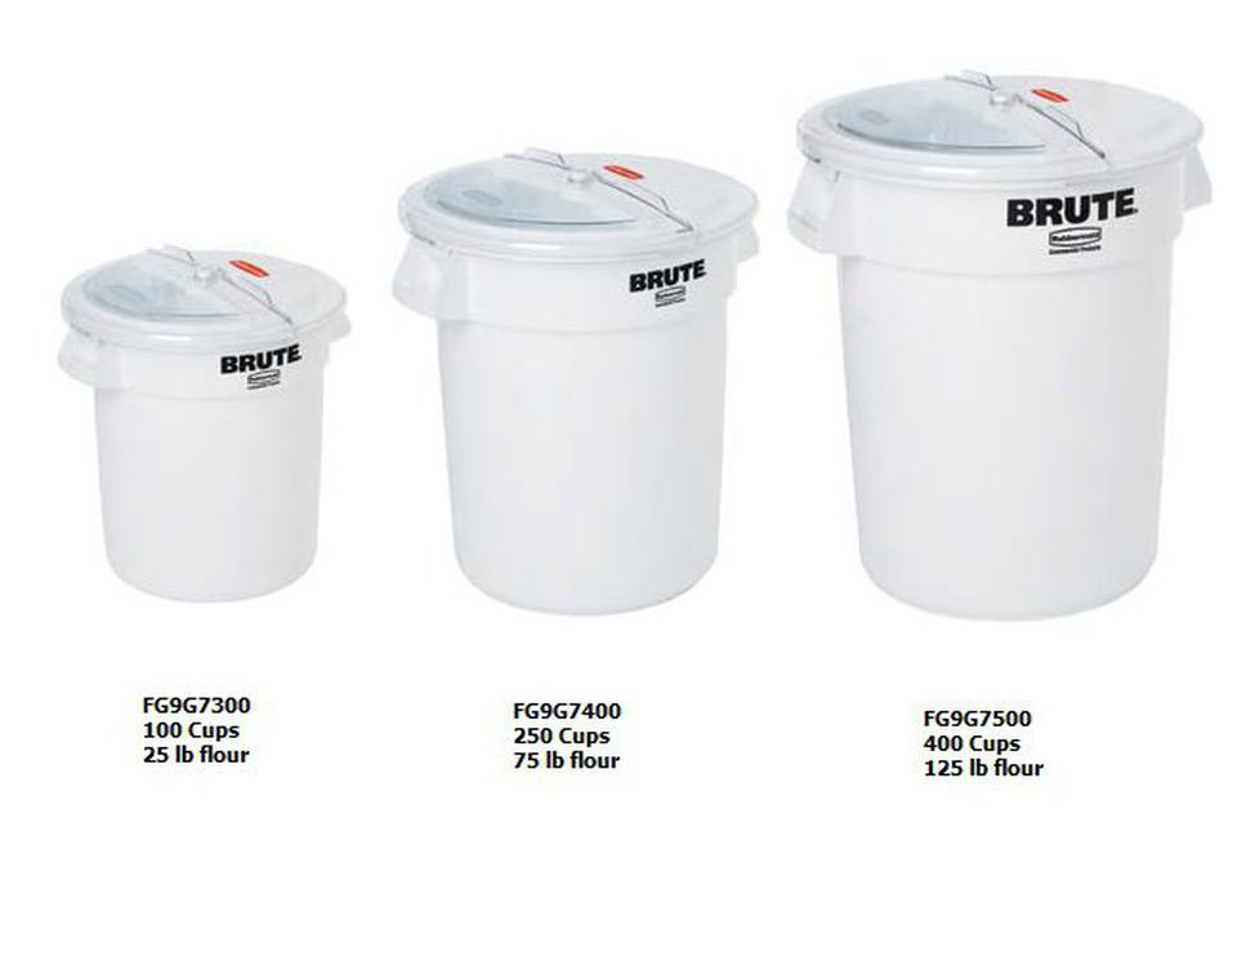 ProSave  Ingredient Container Combos  ถังเก็บวัตถุดิบอาหาร(ถ รูปที่ 2